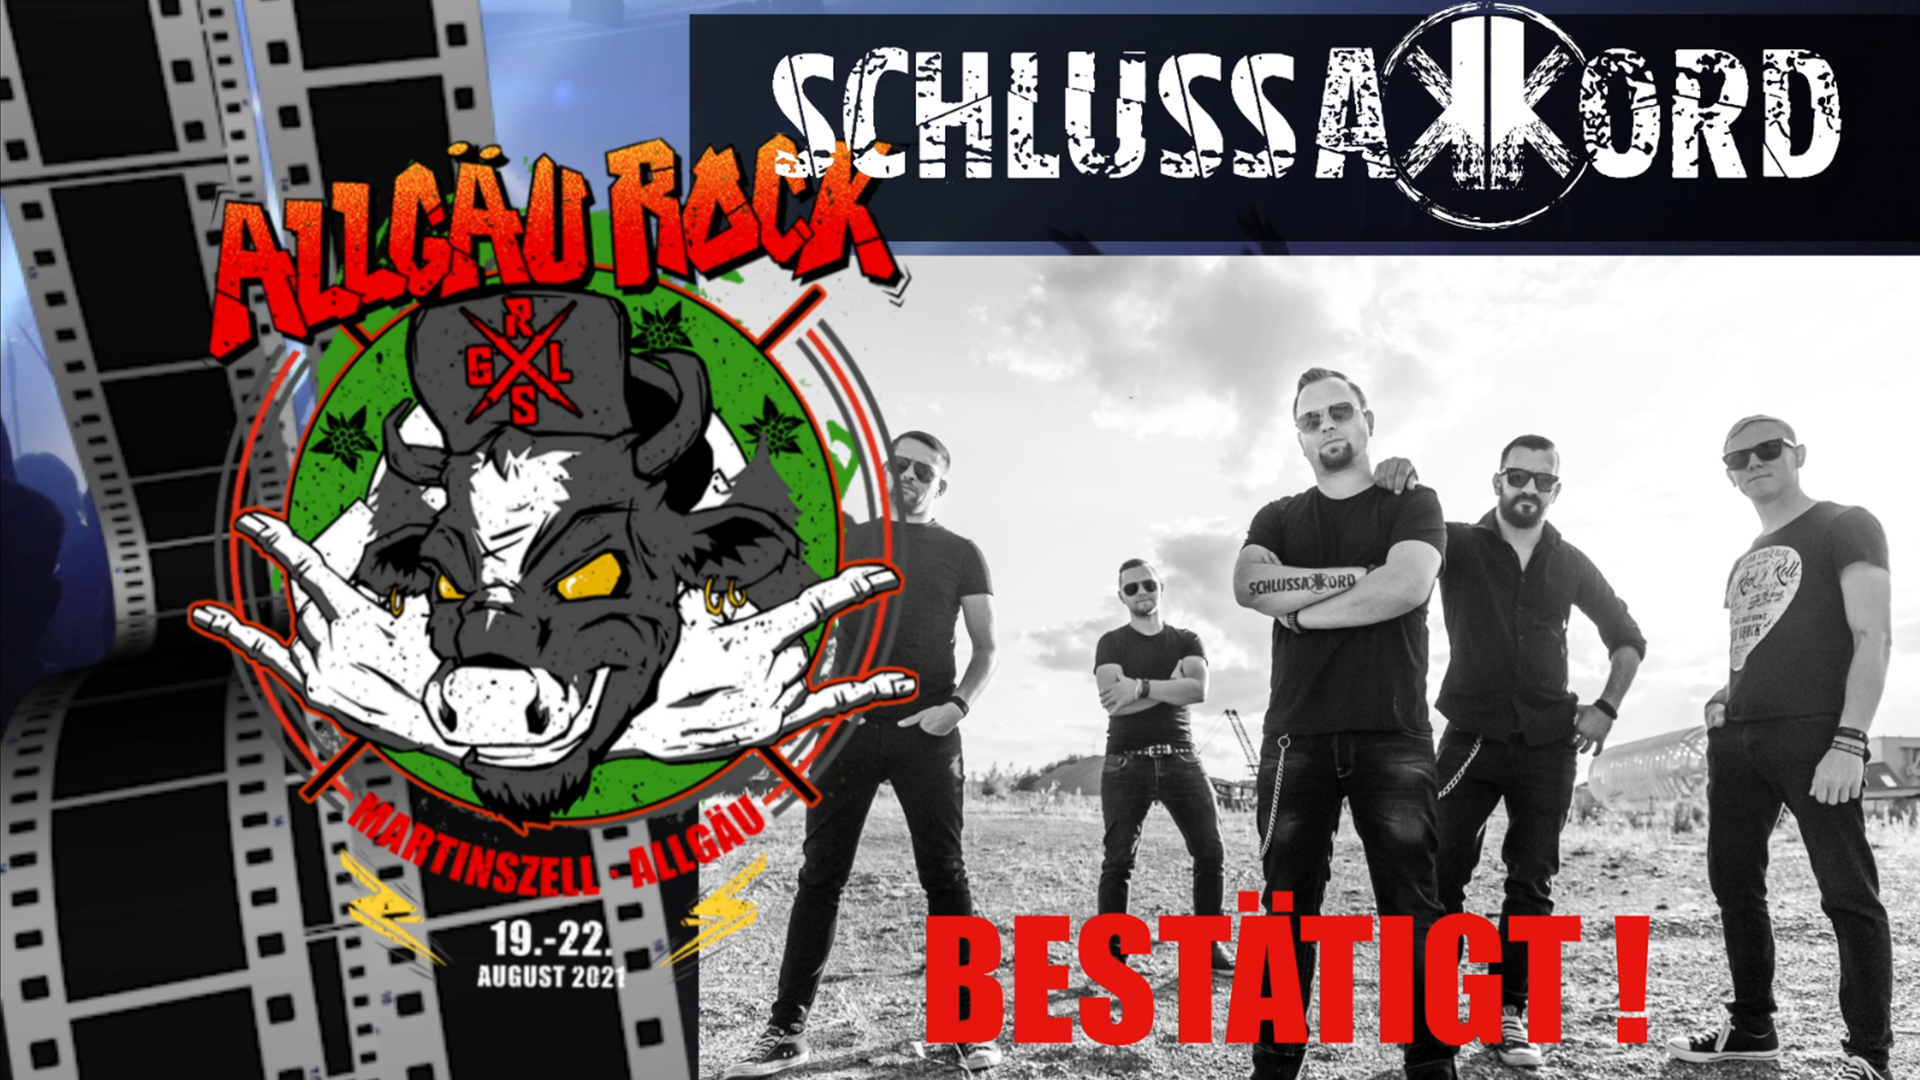 Allgäu Rock 2021 - Schlussakkord [bestät ... | News ...